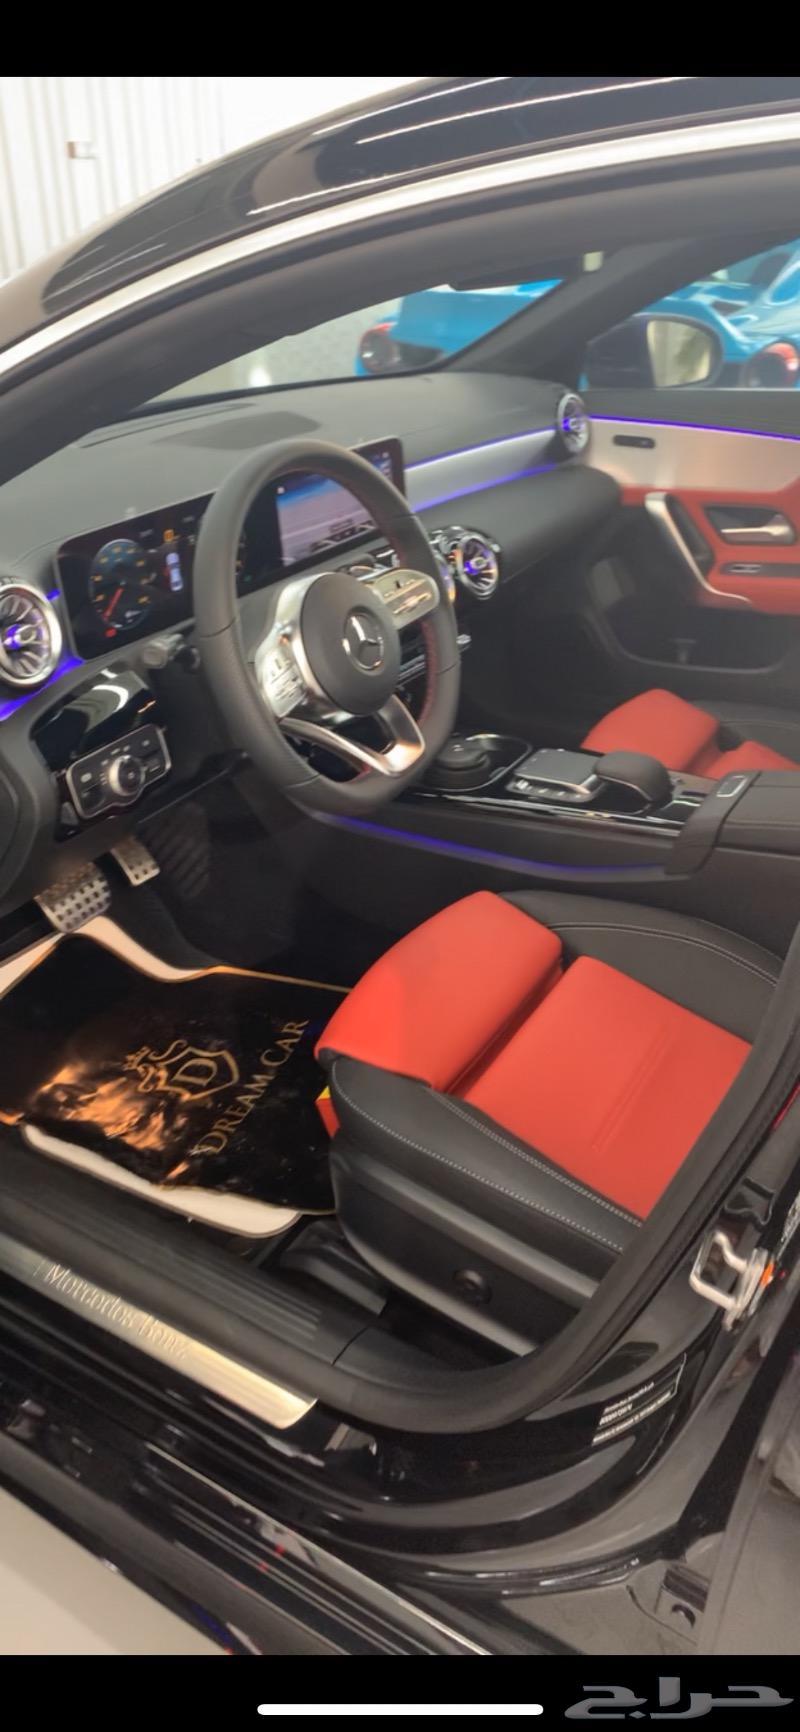 مرسيدس CLA 250 2020 AMG Edition